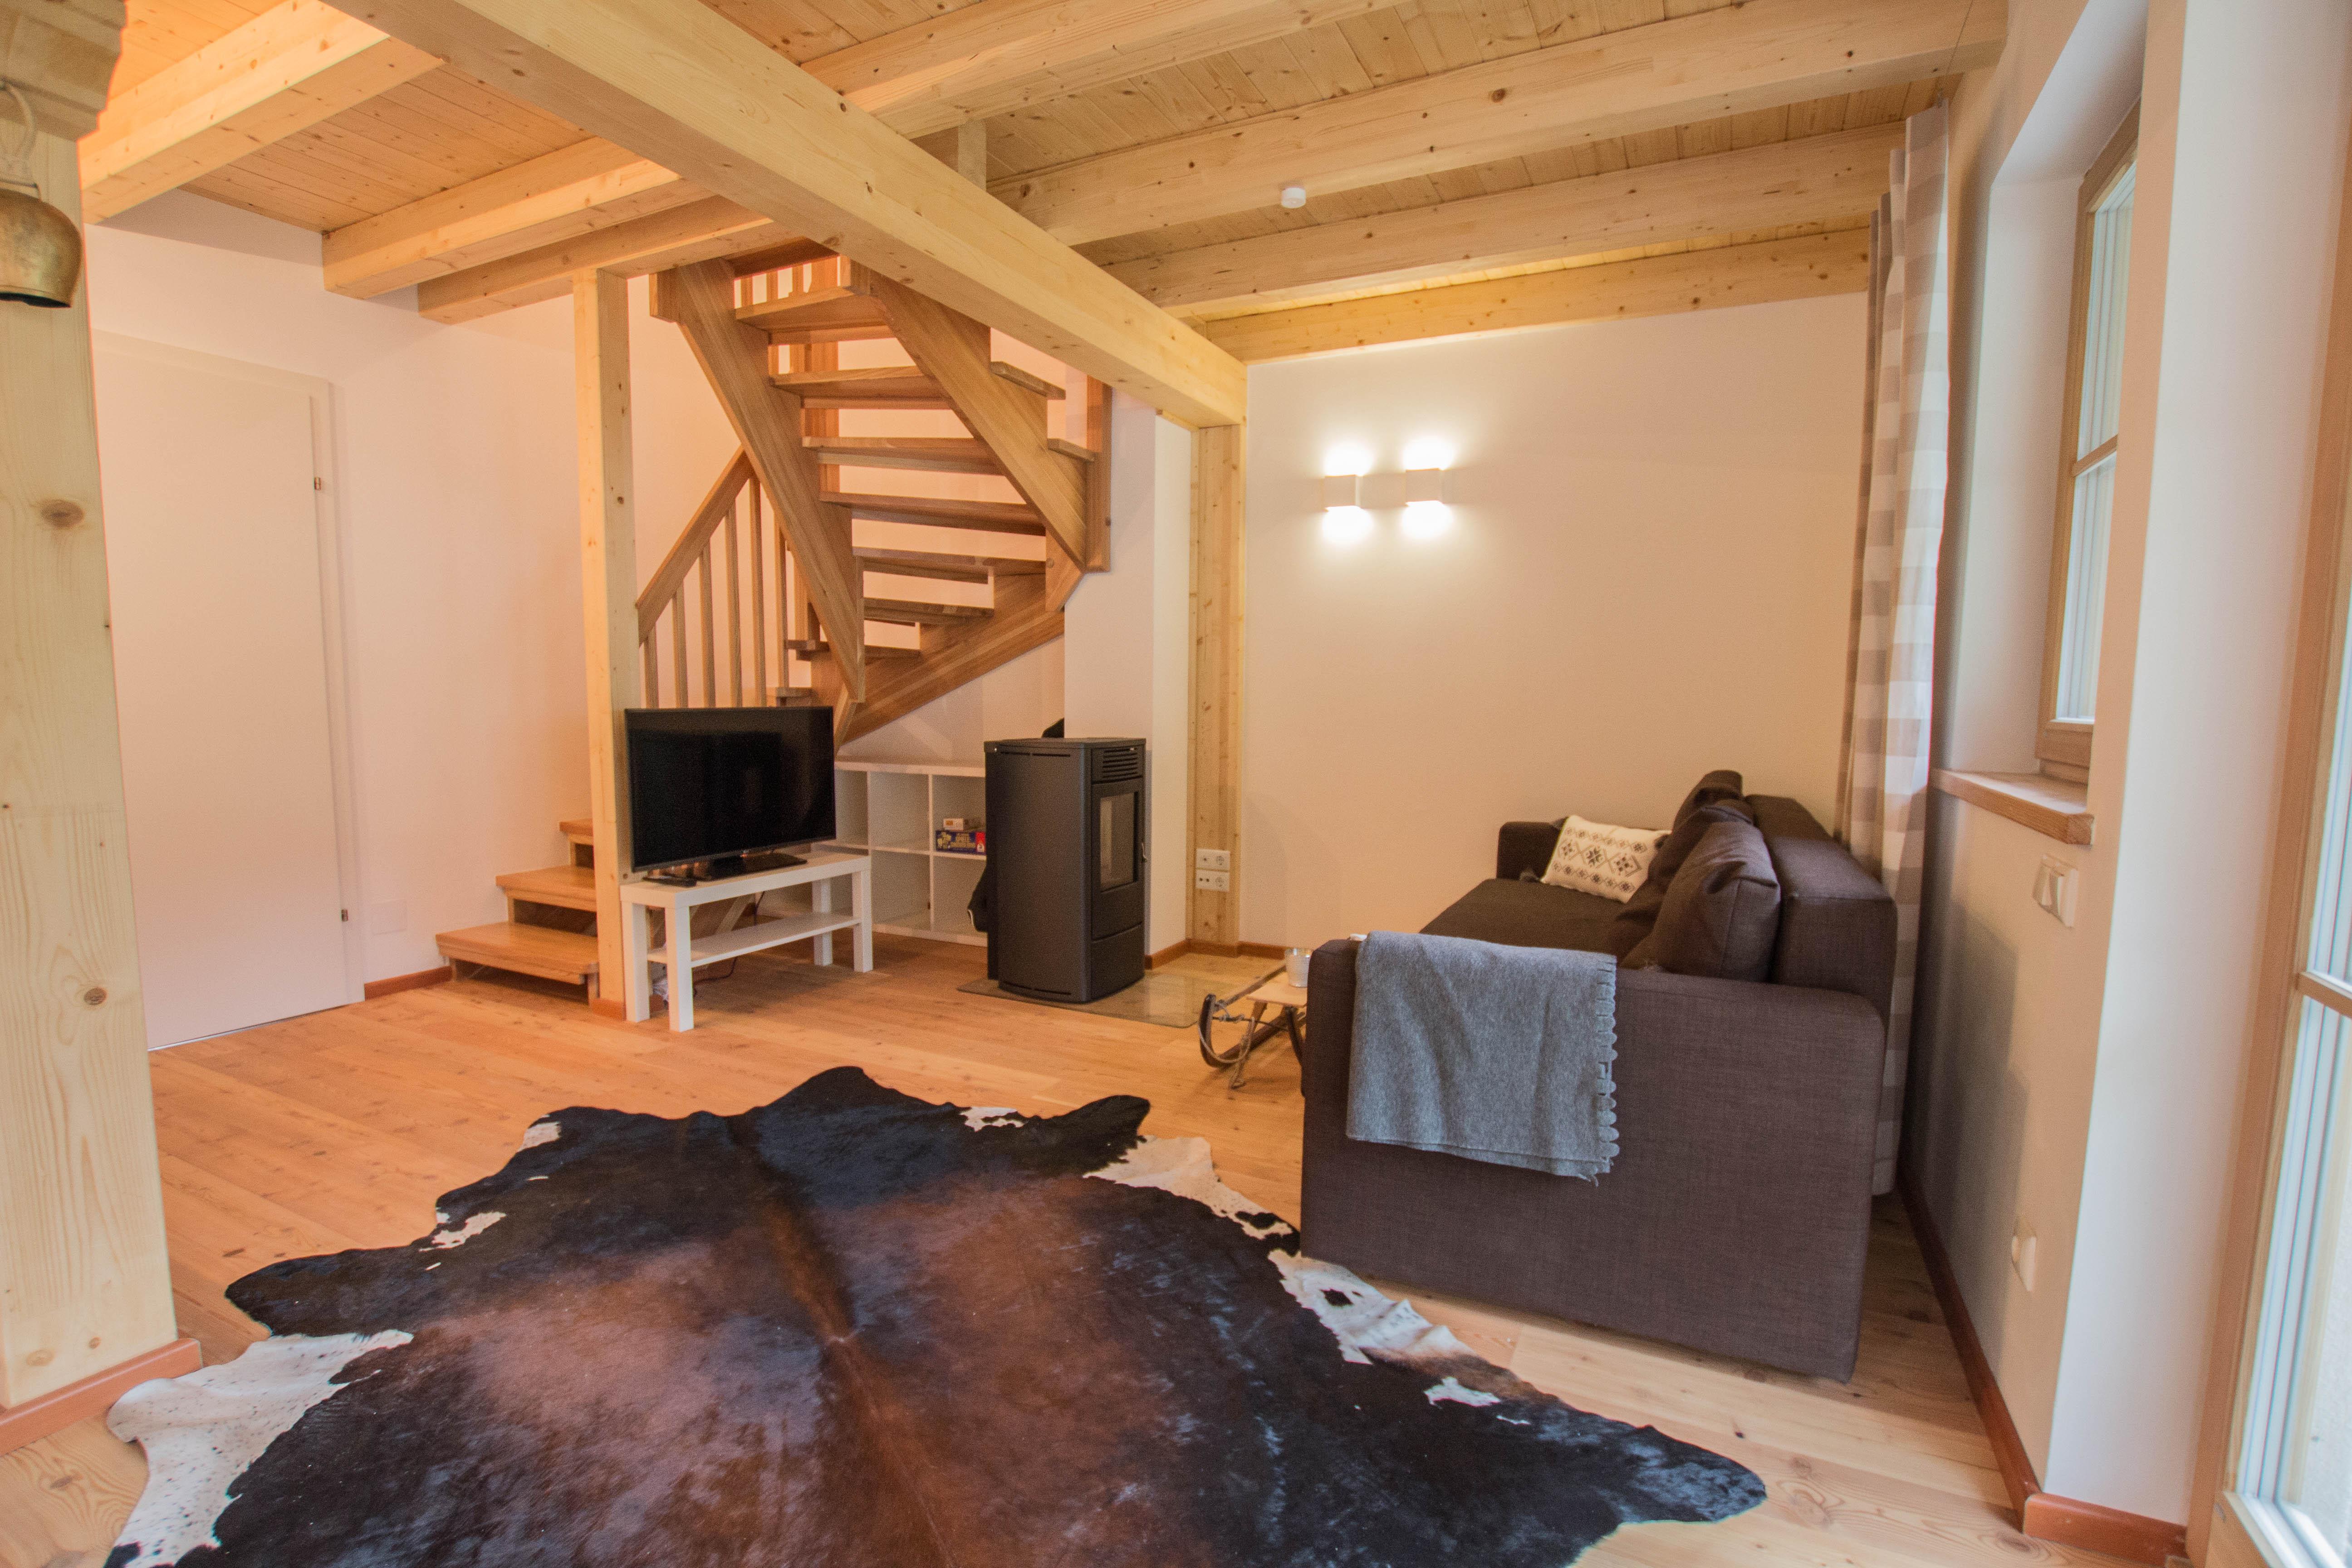 Maison de vacances Lodge Kleiner Bär direkt am Skilift (2050394), Uttendorf, Pinzgau, Salzbourg, Autriche, image 5